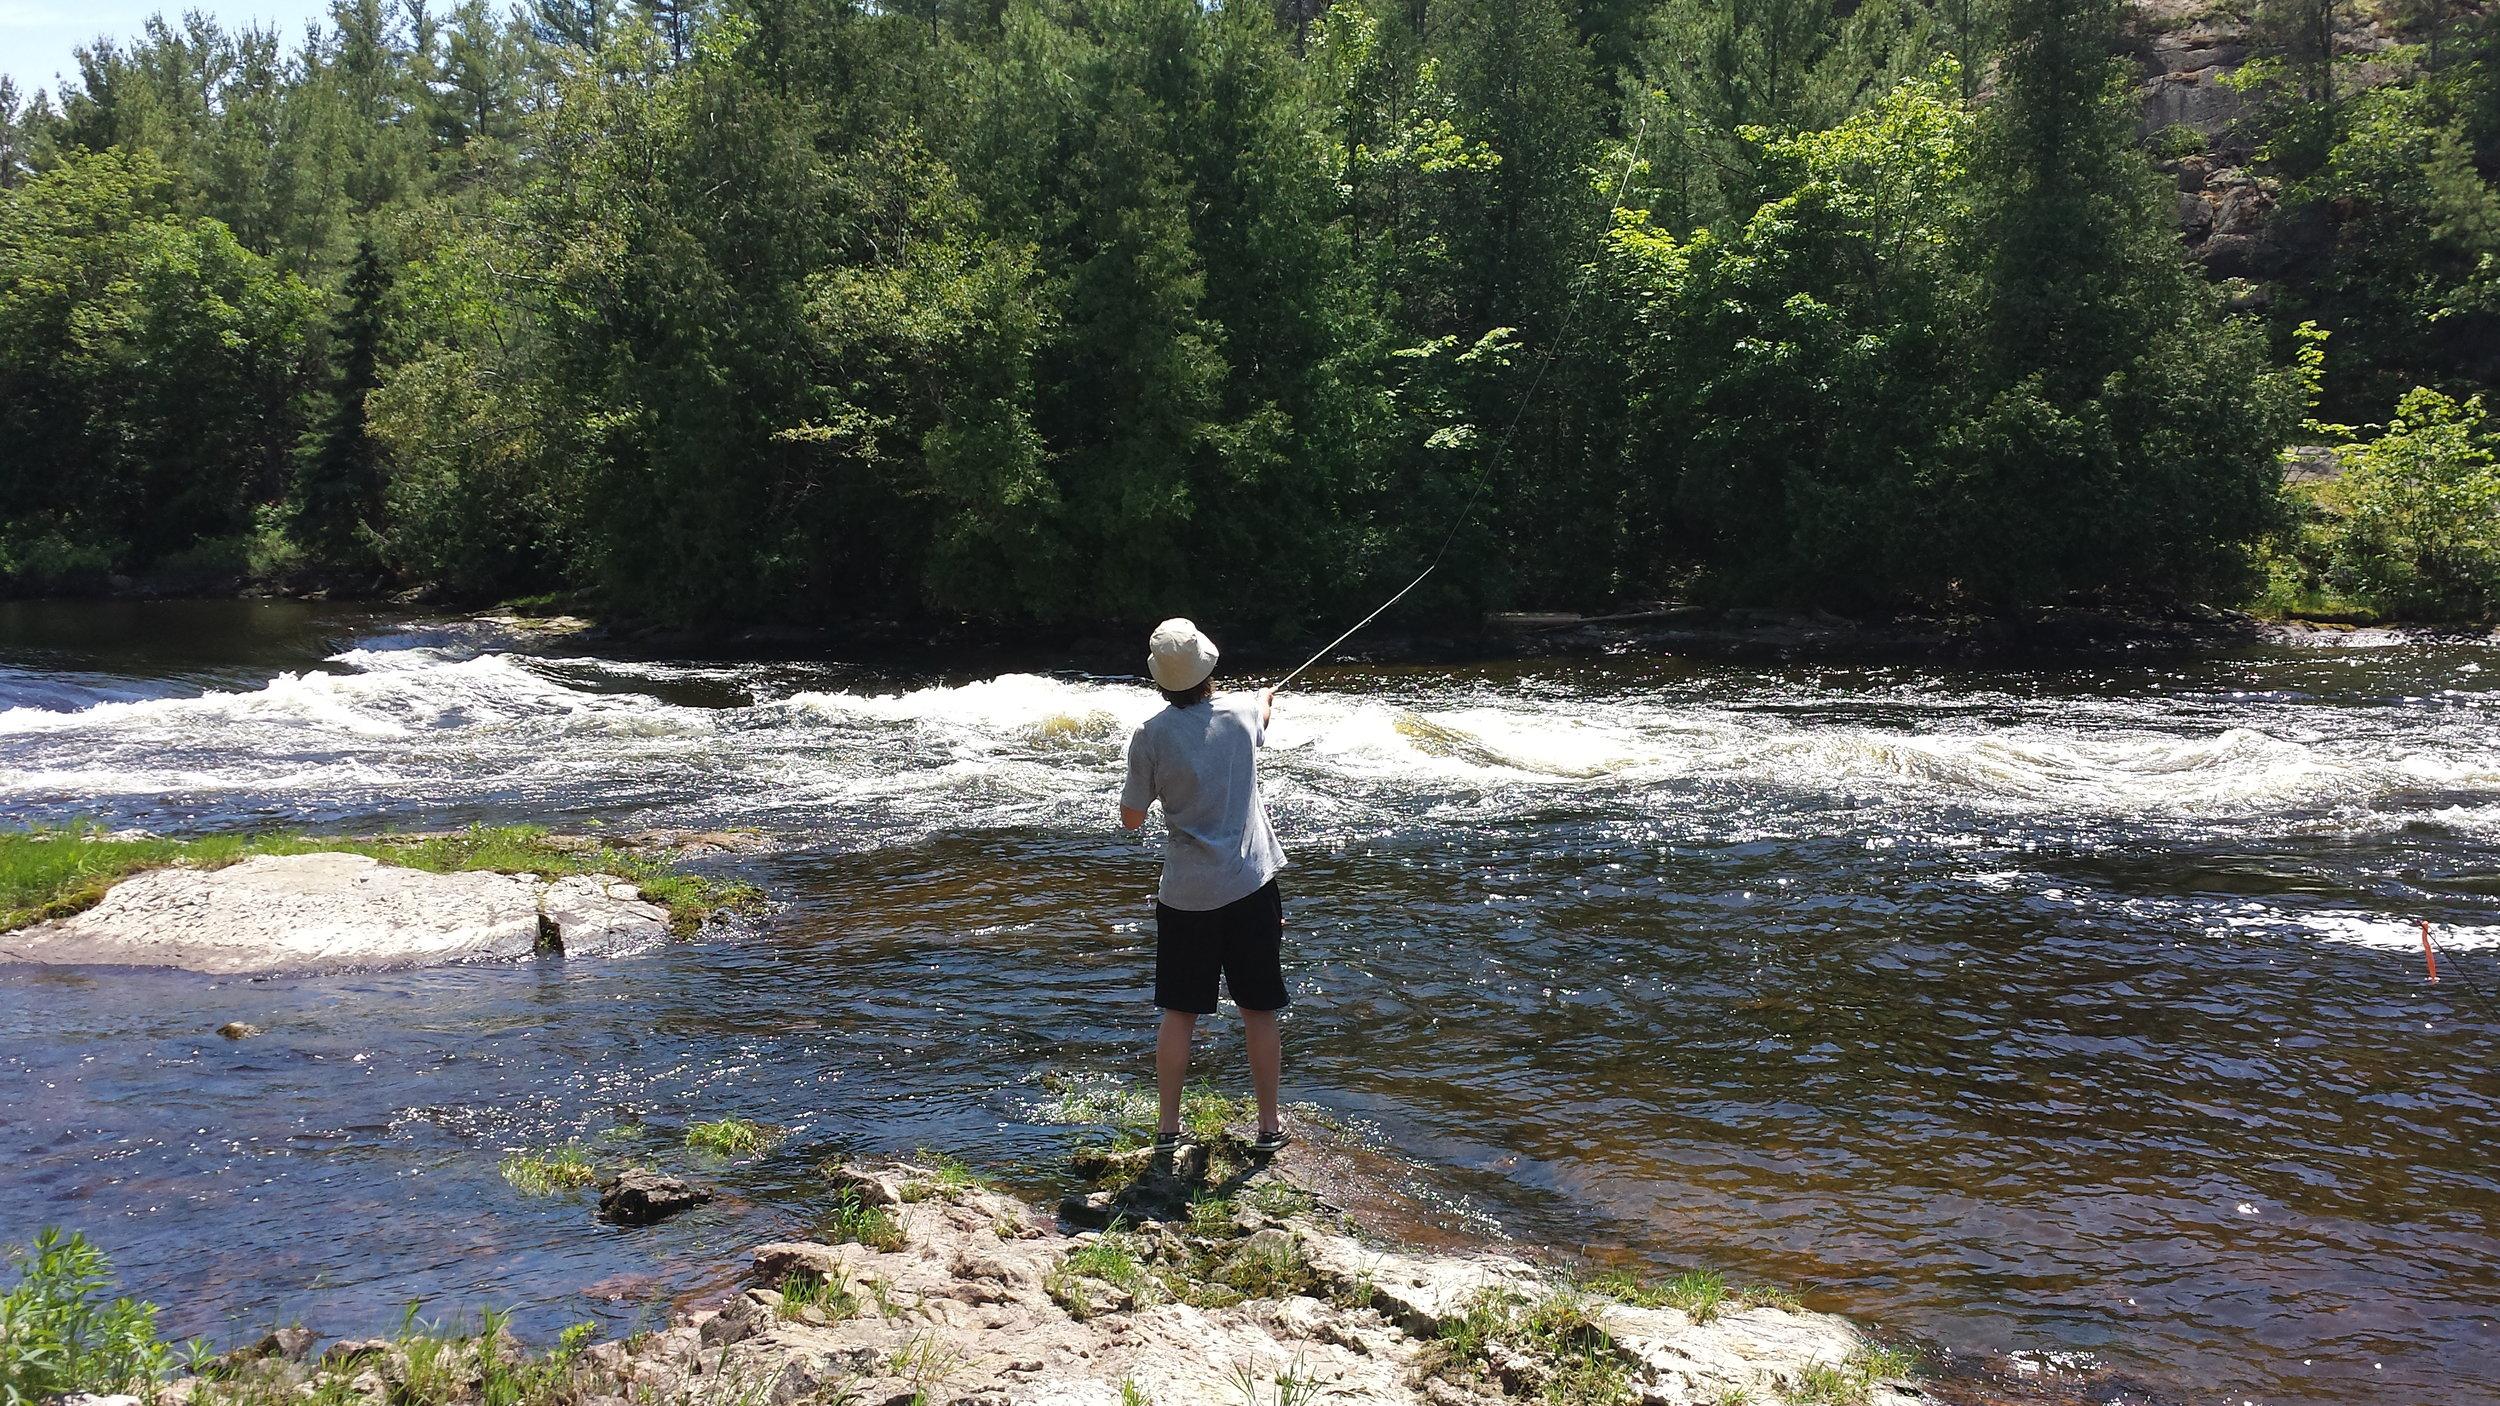 Graeme fishing along the French River